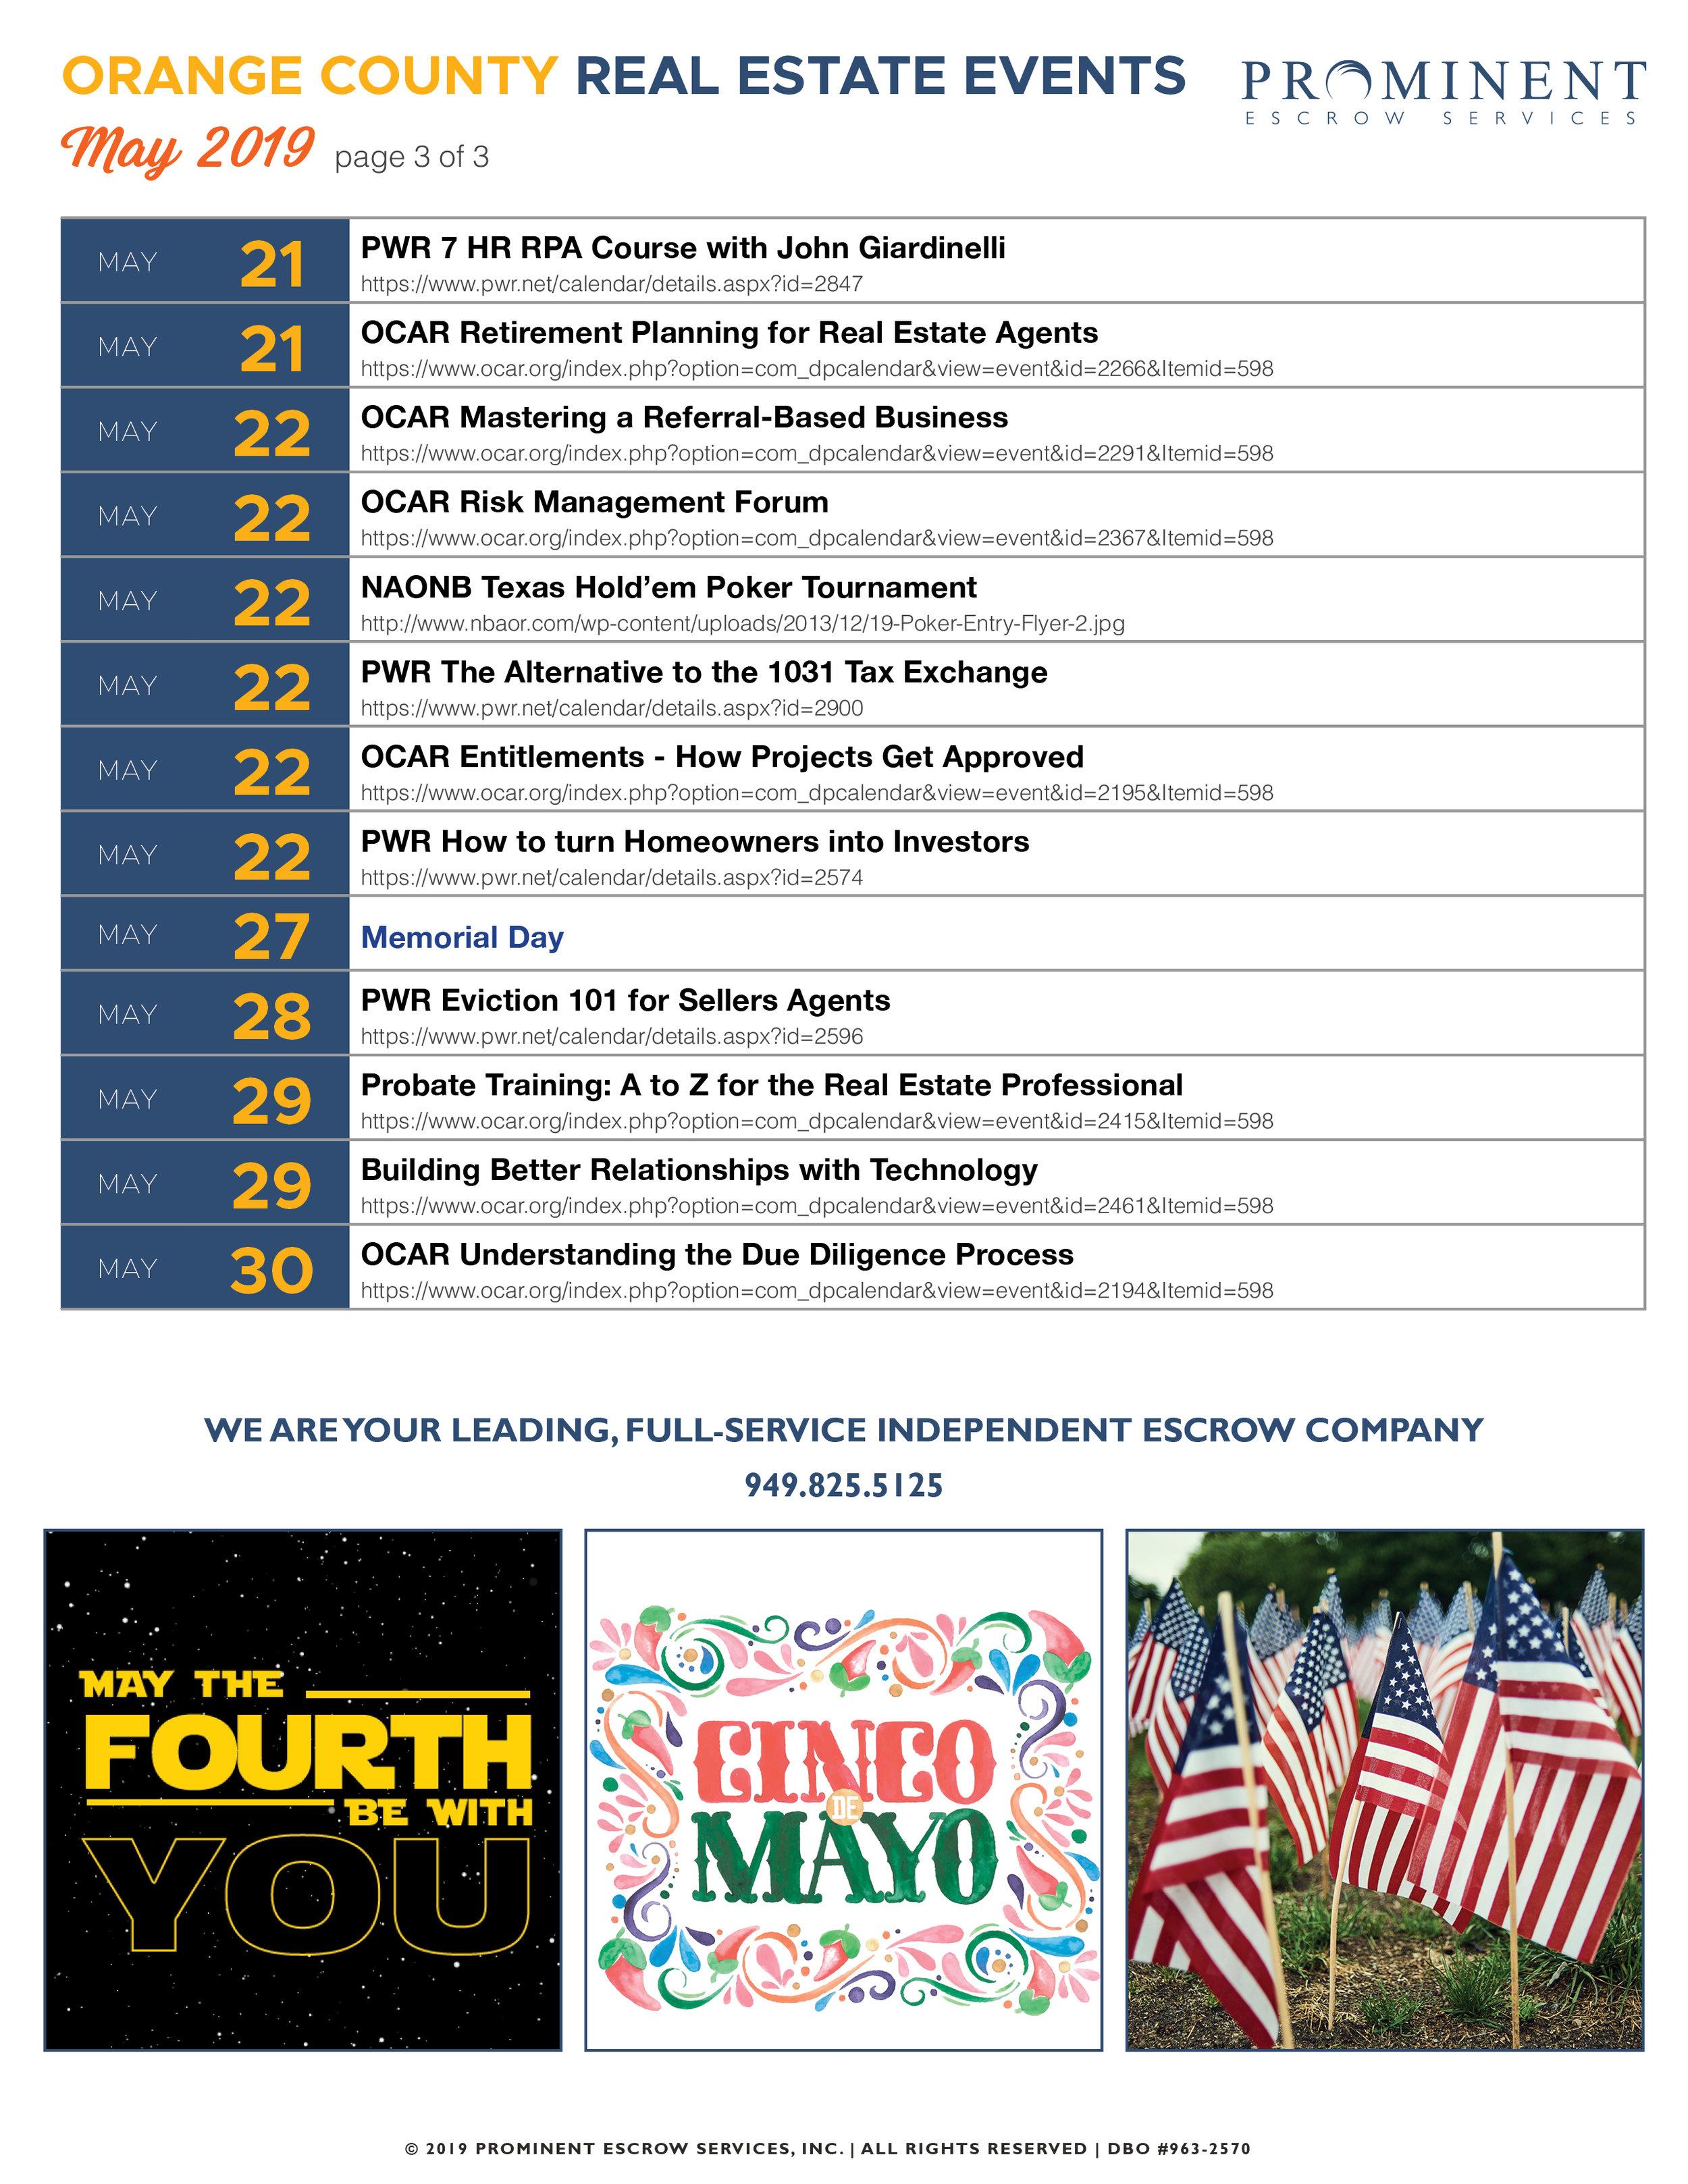 Prominent OC Event calendar_May3.jpg